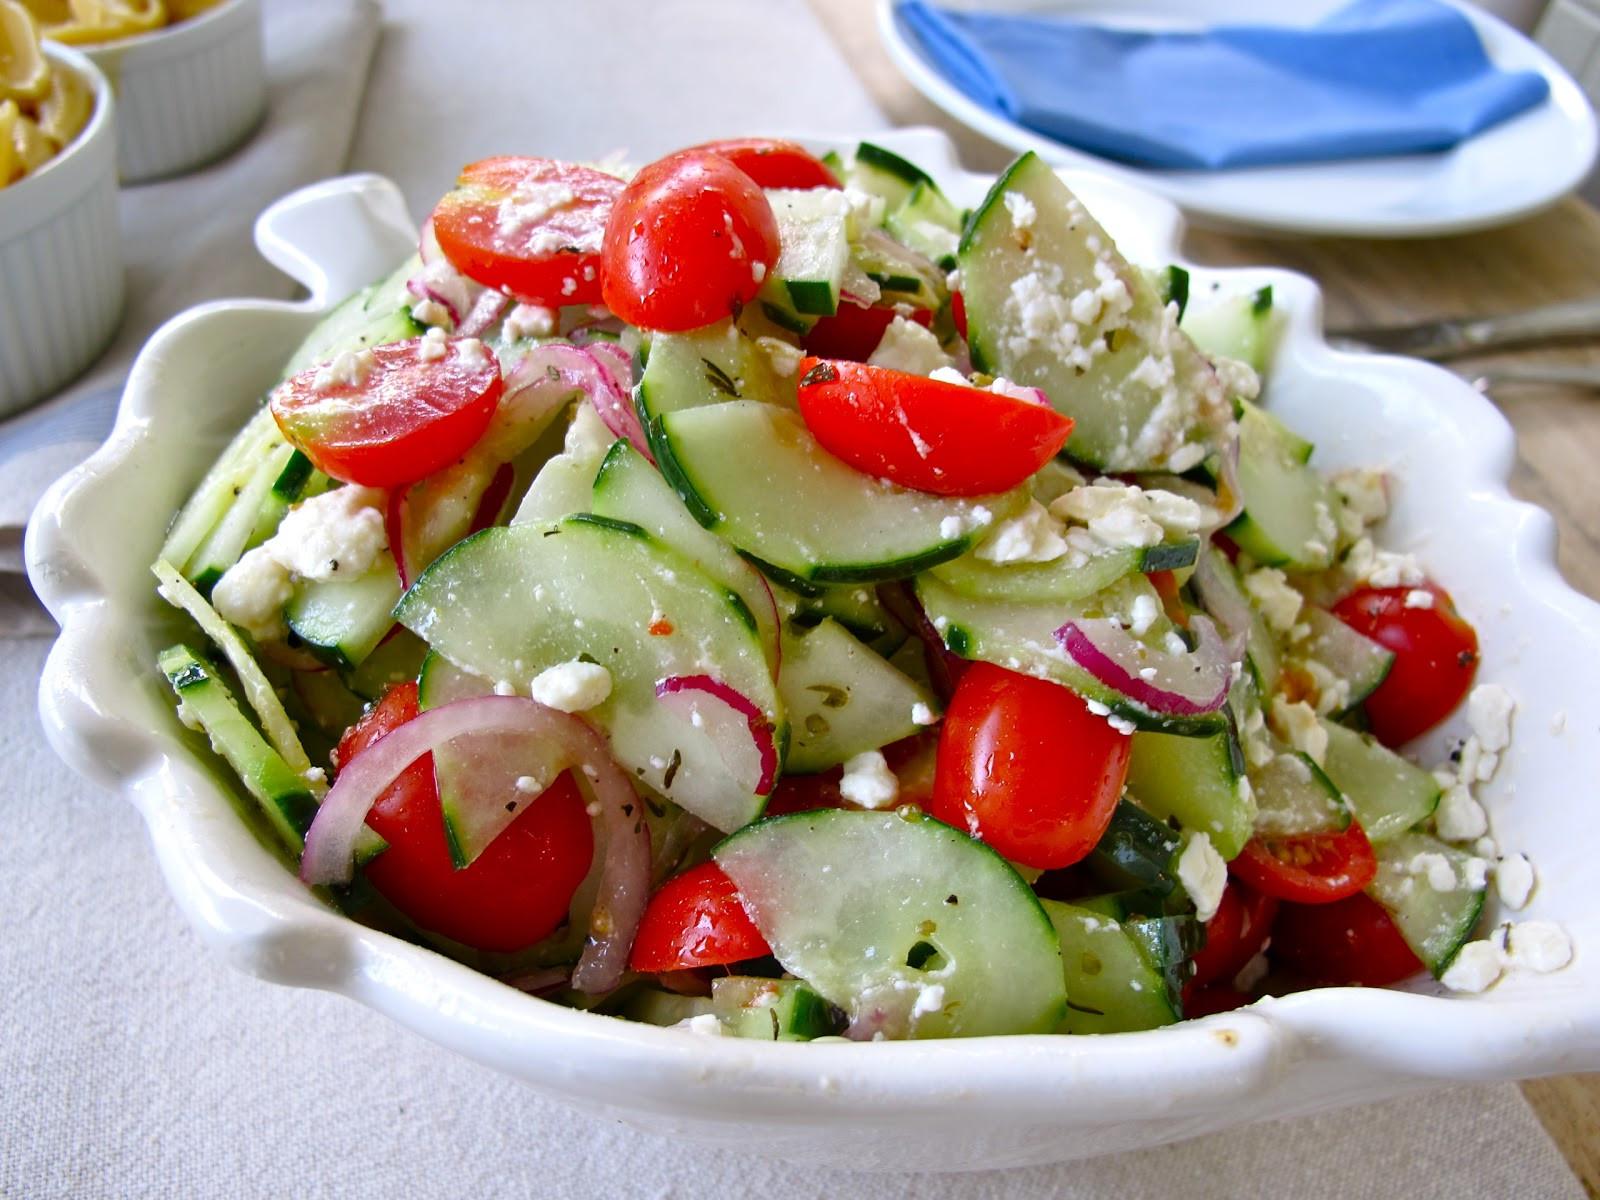 Cucumber Tomato Salad Recipe  Jenny Steffens Hobick Cucumber Tomato & Feta Salad Recipe